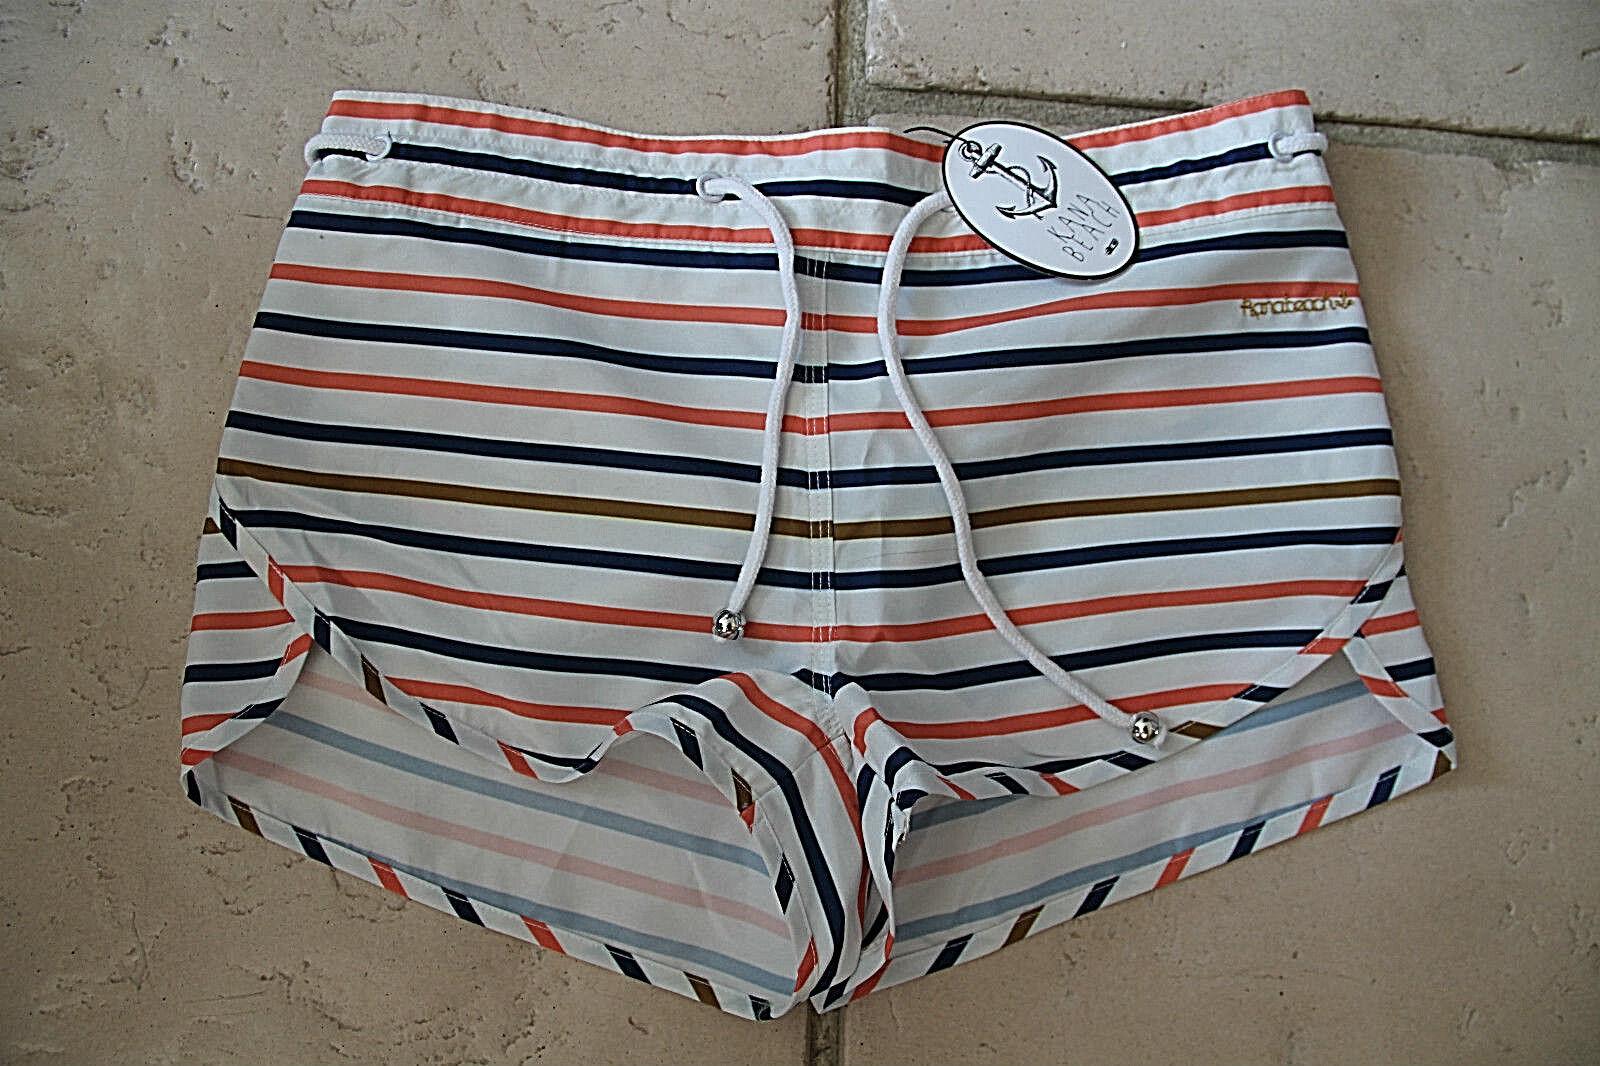 Swimming shorts surf KANABEACH oceanside T 38 NEW LABEL value